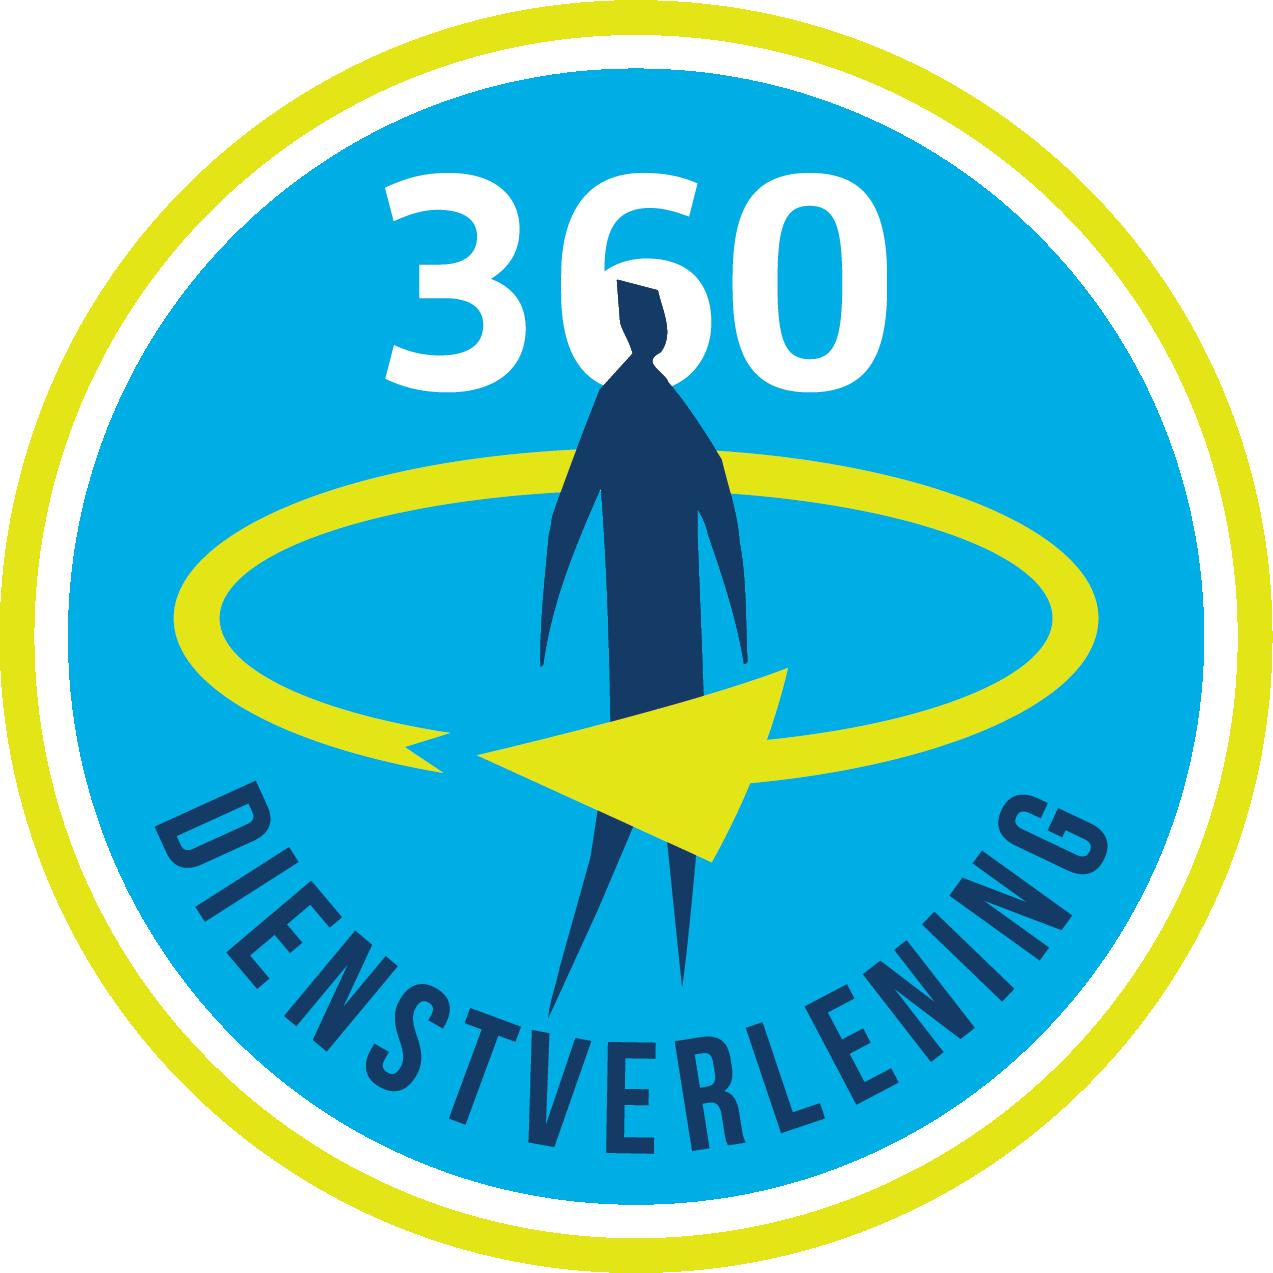 aclvb-universele_diensten-logo-cmyk_ok-2_7.png